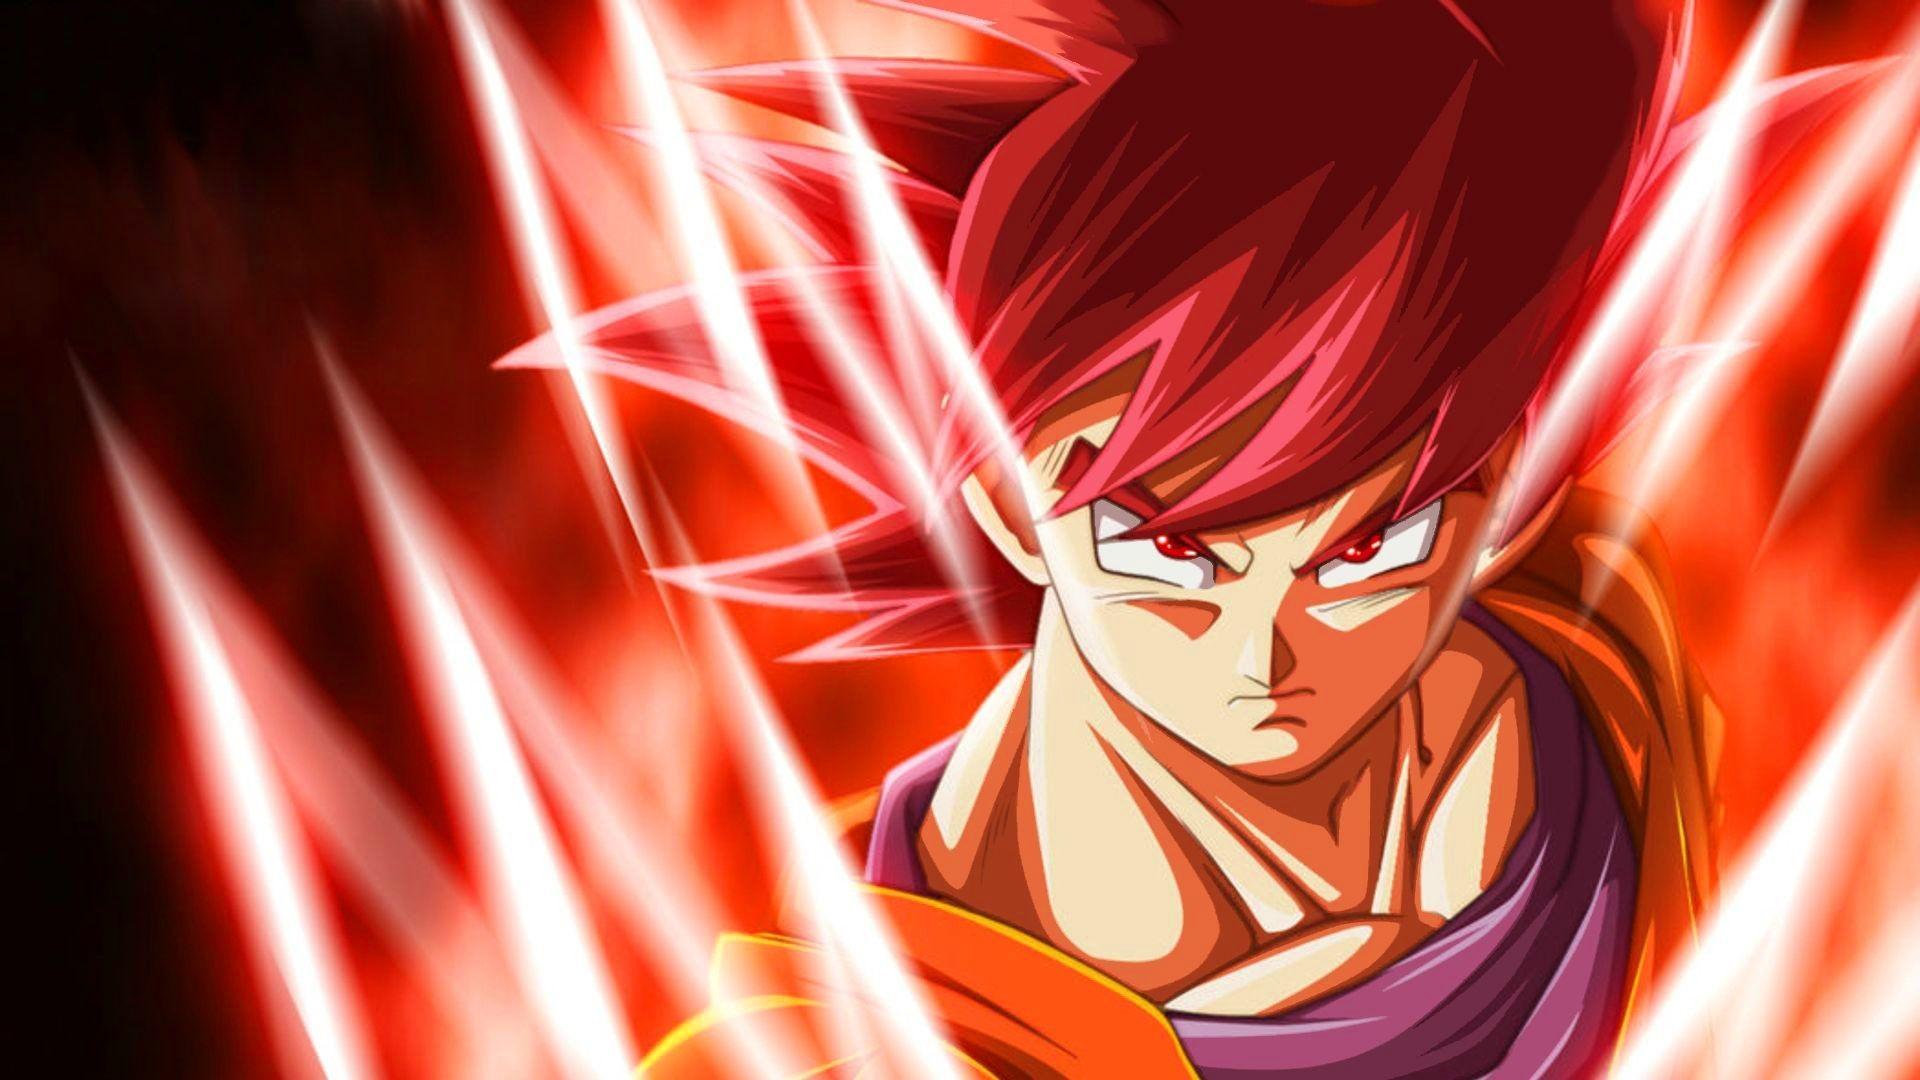 Goku Super Saiyan God Wallpapers, Goku Super Saiyan God .